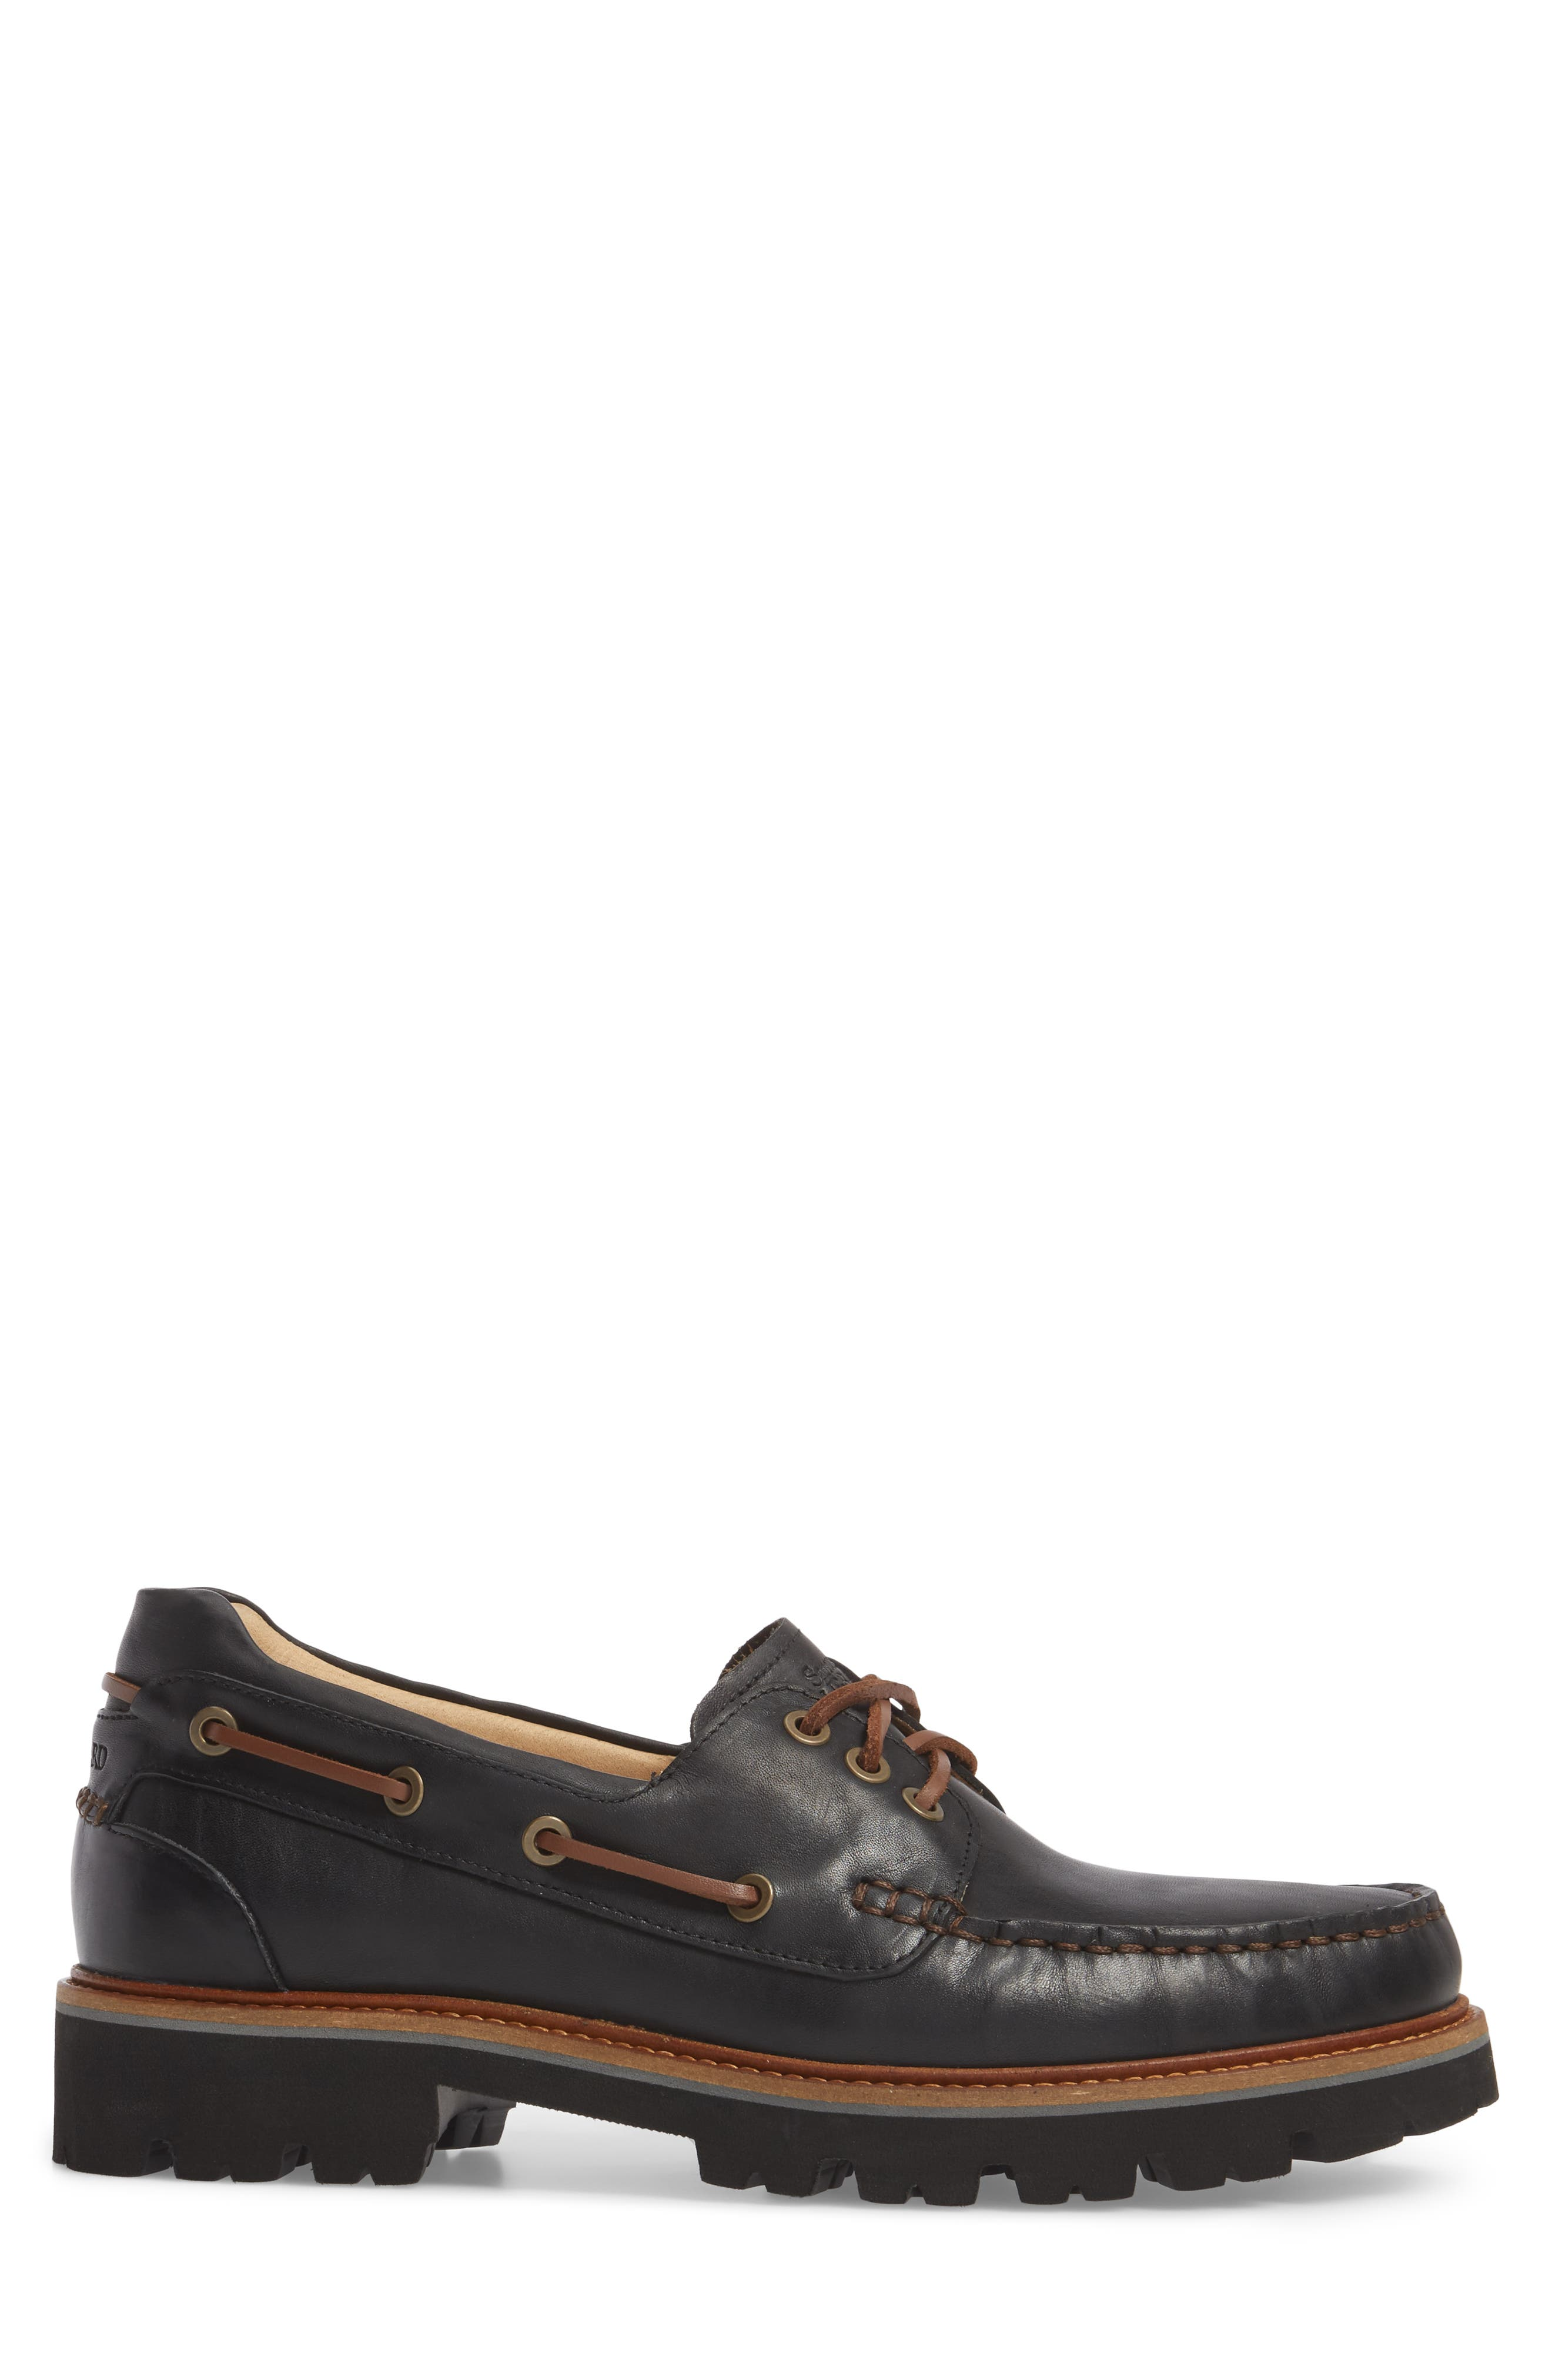 Camplight Water Resistant Boat Shoe,                             Alternate thumbnail 3, color,                             Saddlebag Black Leather